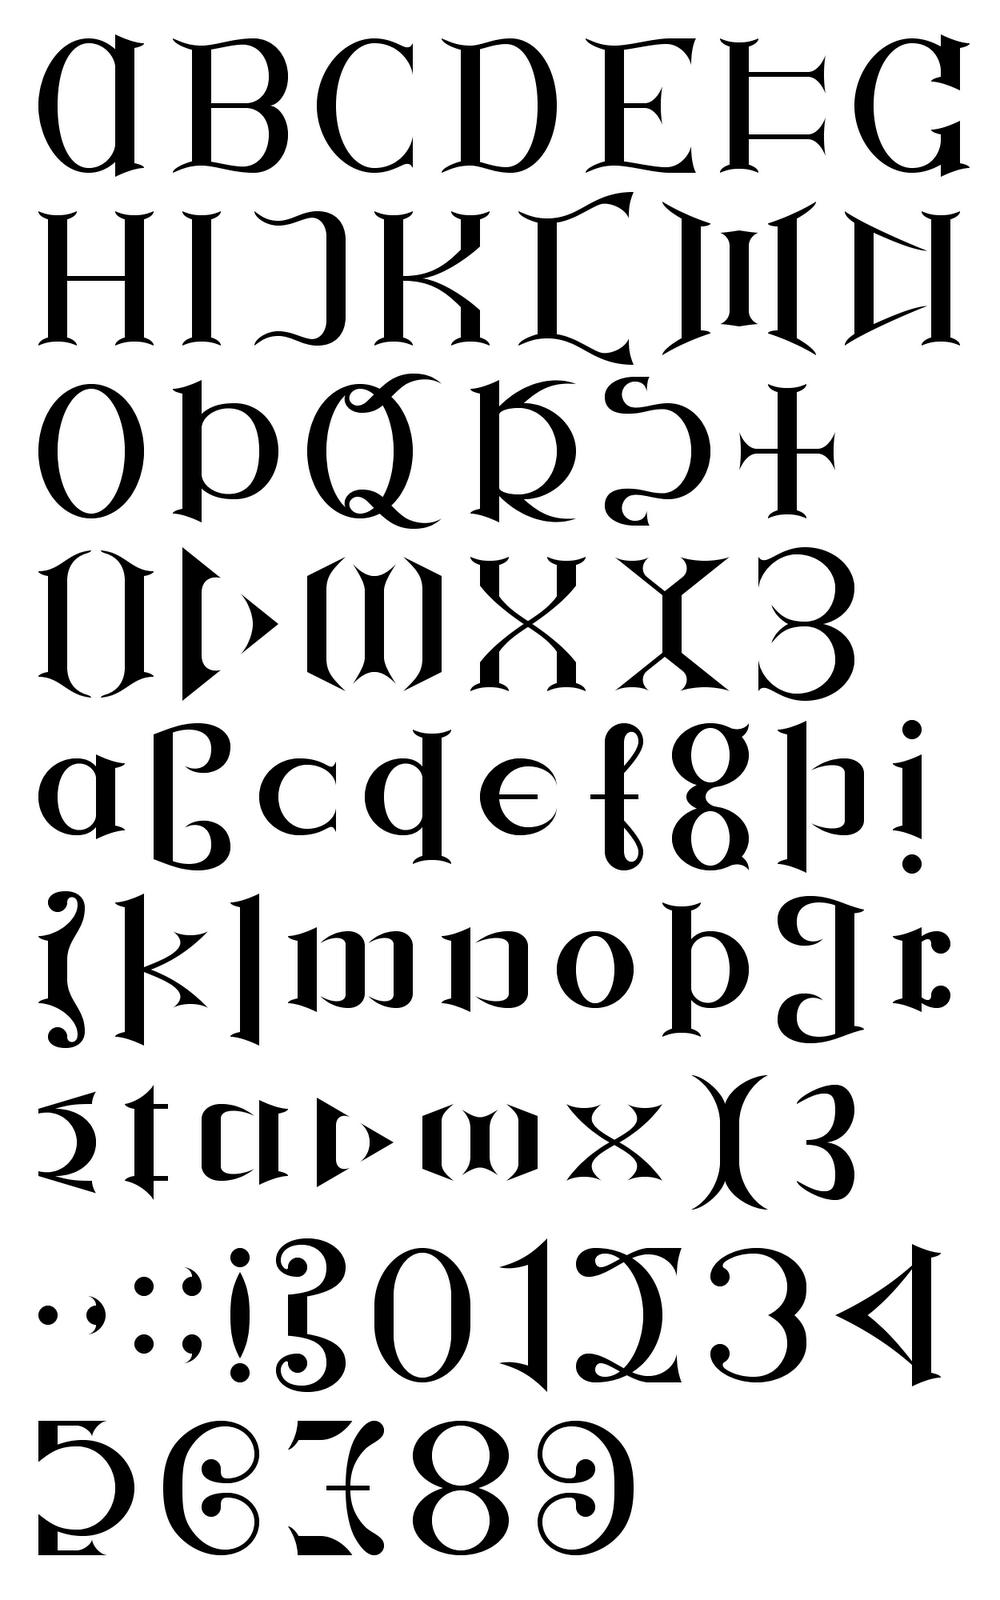 Ambigram Font   Graphic Design: Ambigrams   Tattoo Fonts, Tattoo - Ambigram Generator Free Printable